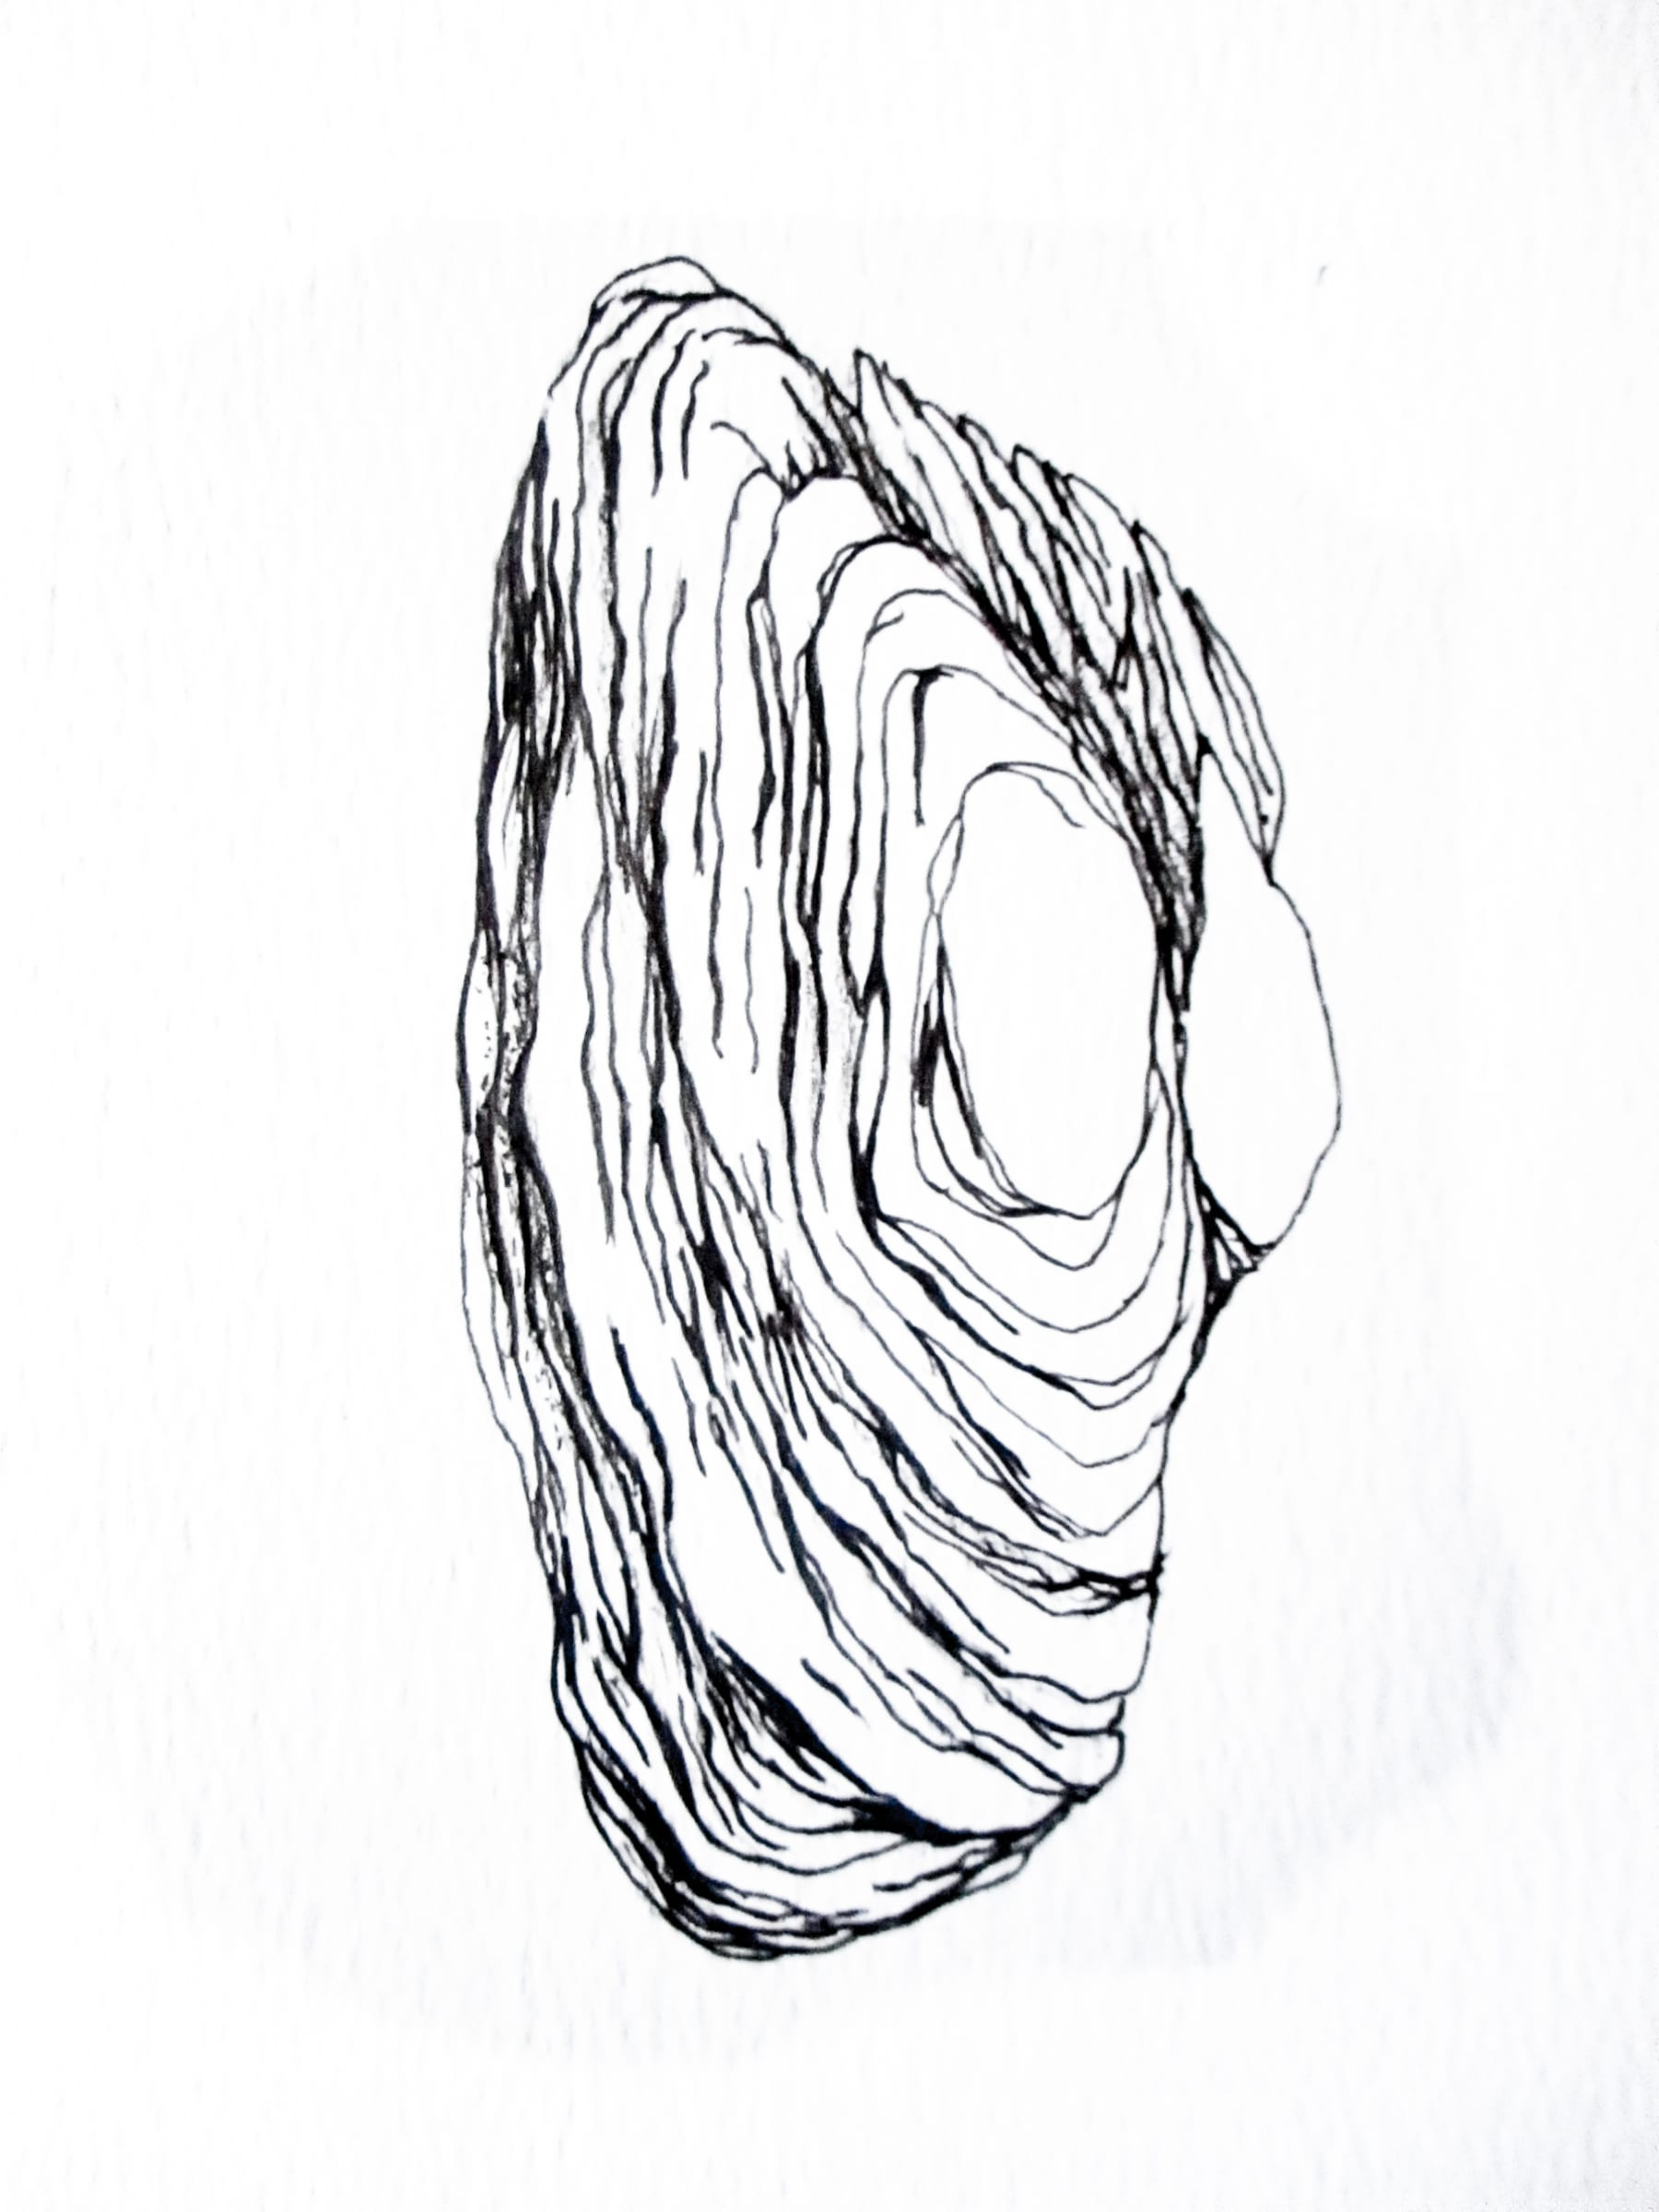 <span class=&#34;link fancybox-details-link&#34;><a href=&#34;/artists/90-mmabatho-grace-mokalapa/works/2314-mmabatho-grace-mokalapa-day-26-2018/&#34;>View Detail Page</a></span><div class=&#34;artist&#34;><strong>Mmabatho Grace Mokalapa</strong></div> <div class=&#34;title&#34;><em>Day 26</em>, 2018</div> <div class=&#34;medium&#34;>Ink On Watercolour Paper</div> <div class=&#34;dimensions&#34;>21cm x 14.8cm</div><div class=&#34;price&#34;>R480.00</div>